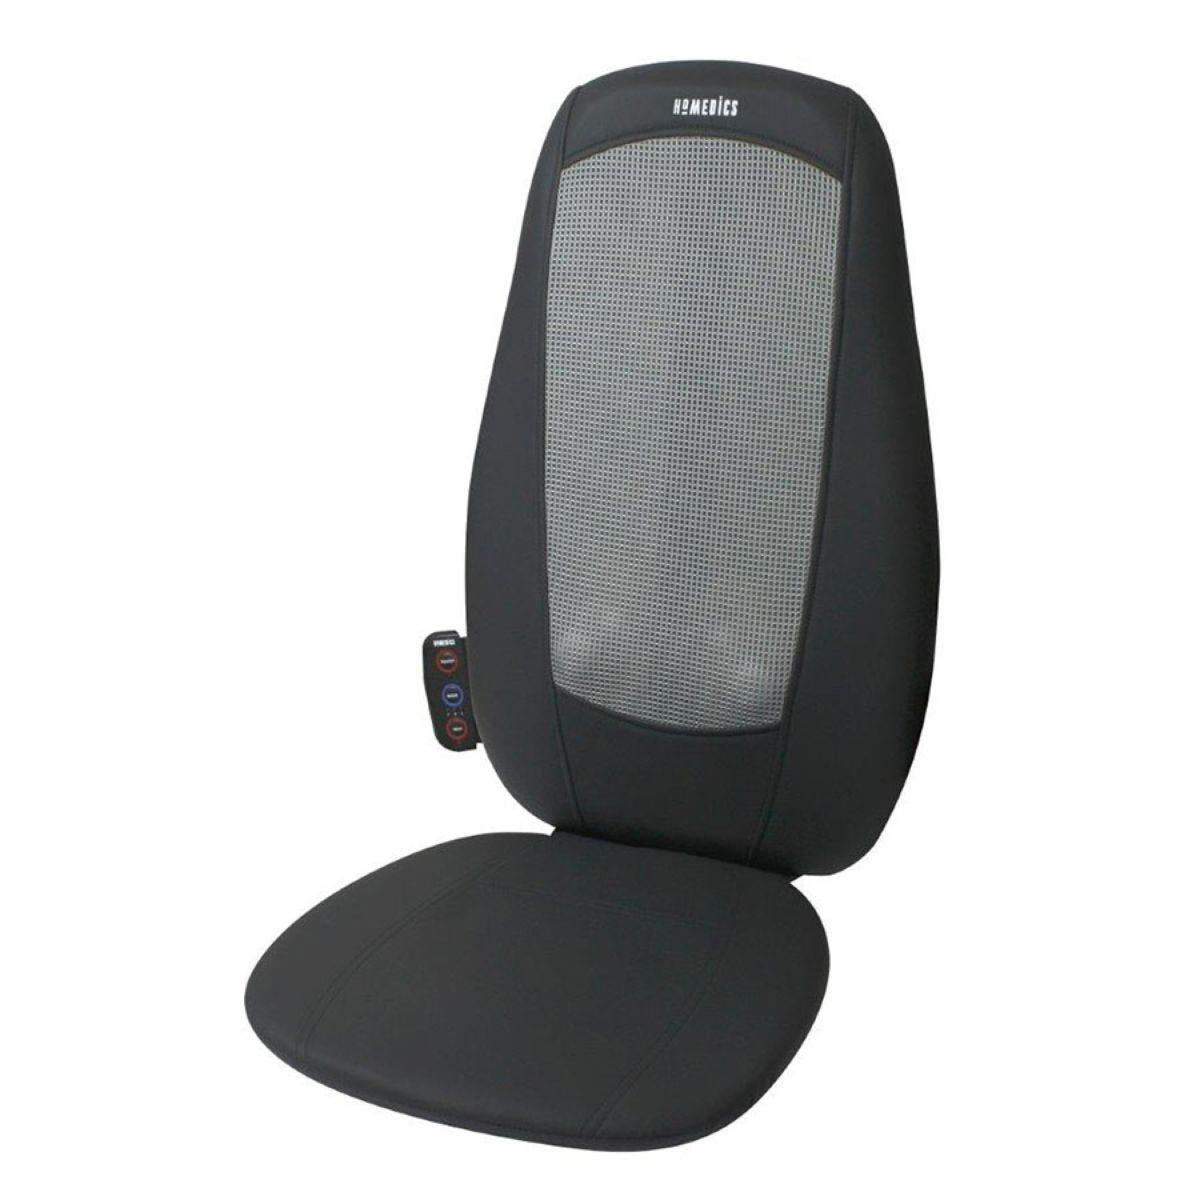 Homedics Shiatsu Massage Heat Cushion - Black